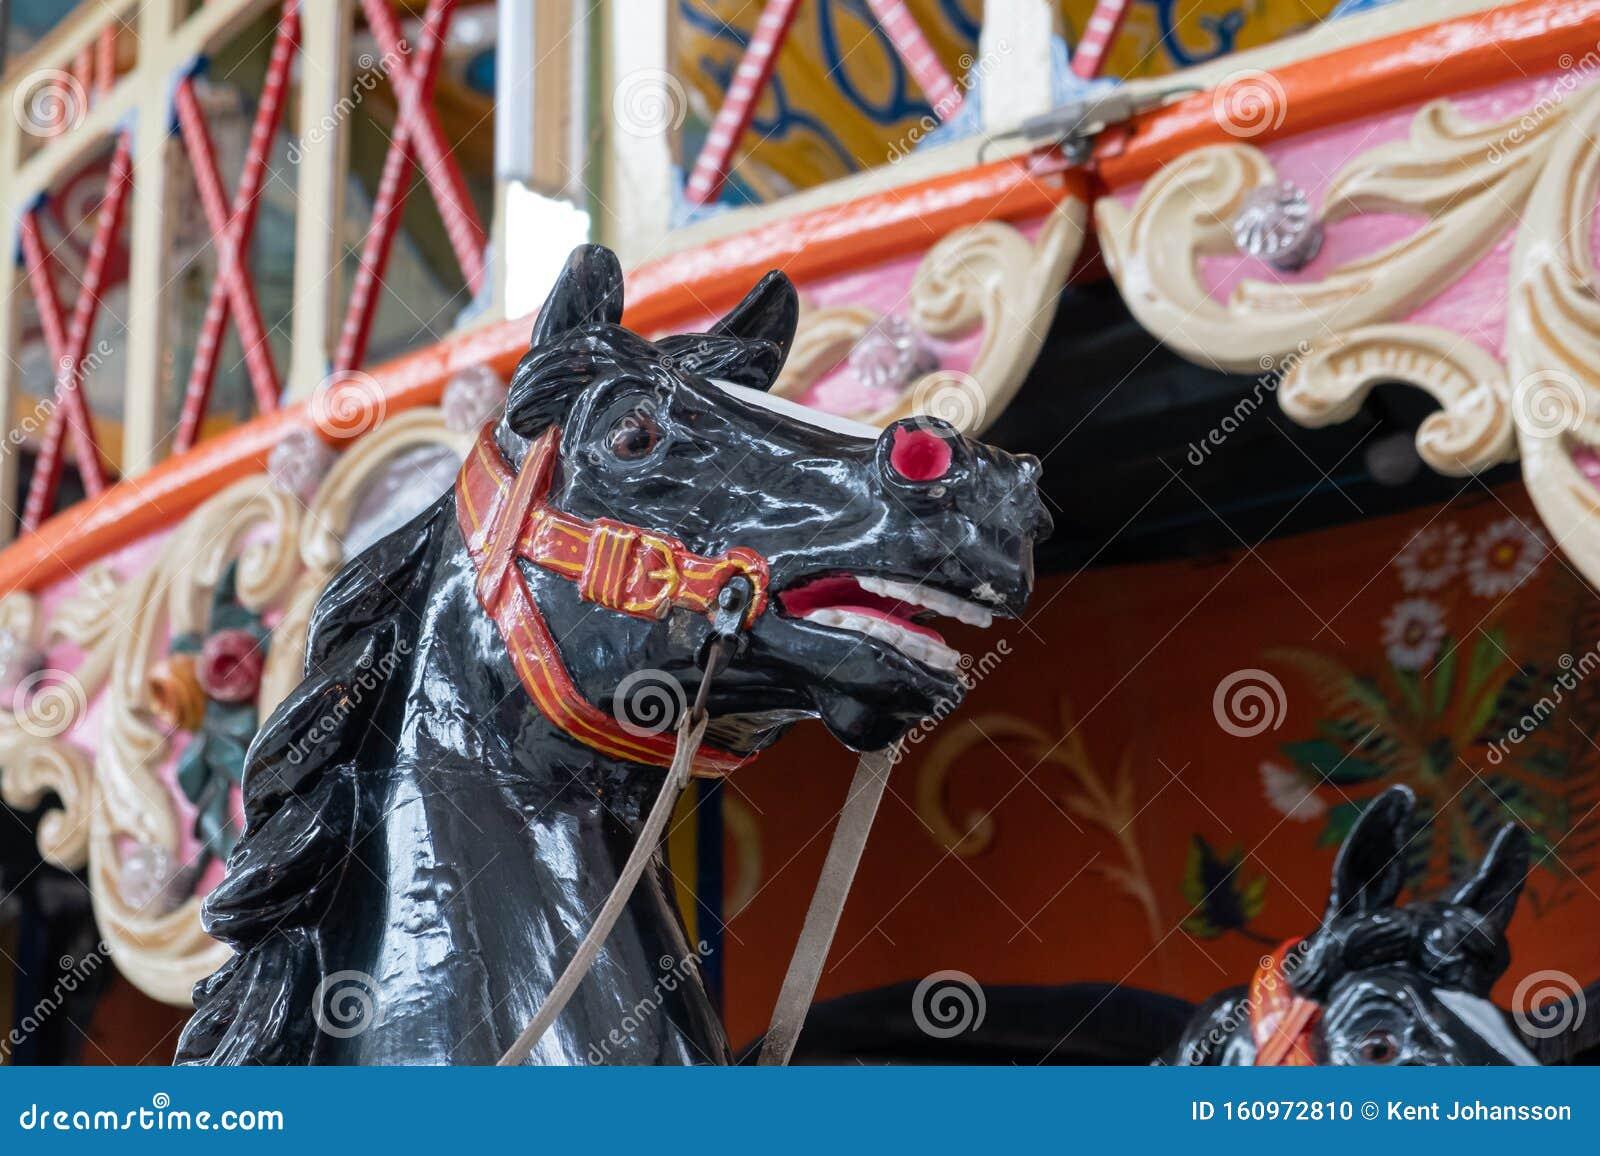 Head Of Black Carousel Horse Stock Photo Image Of Children Memories 160972810